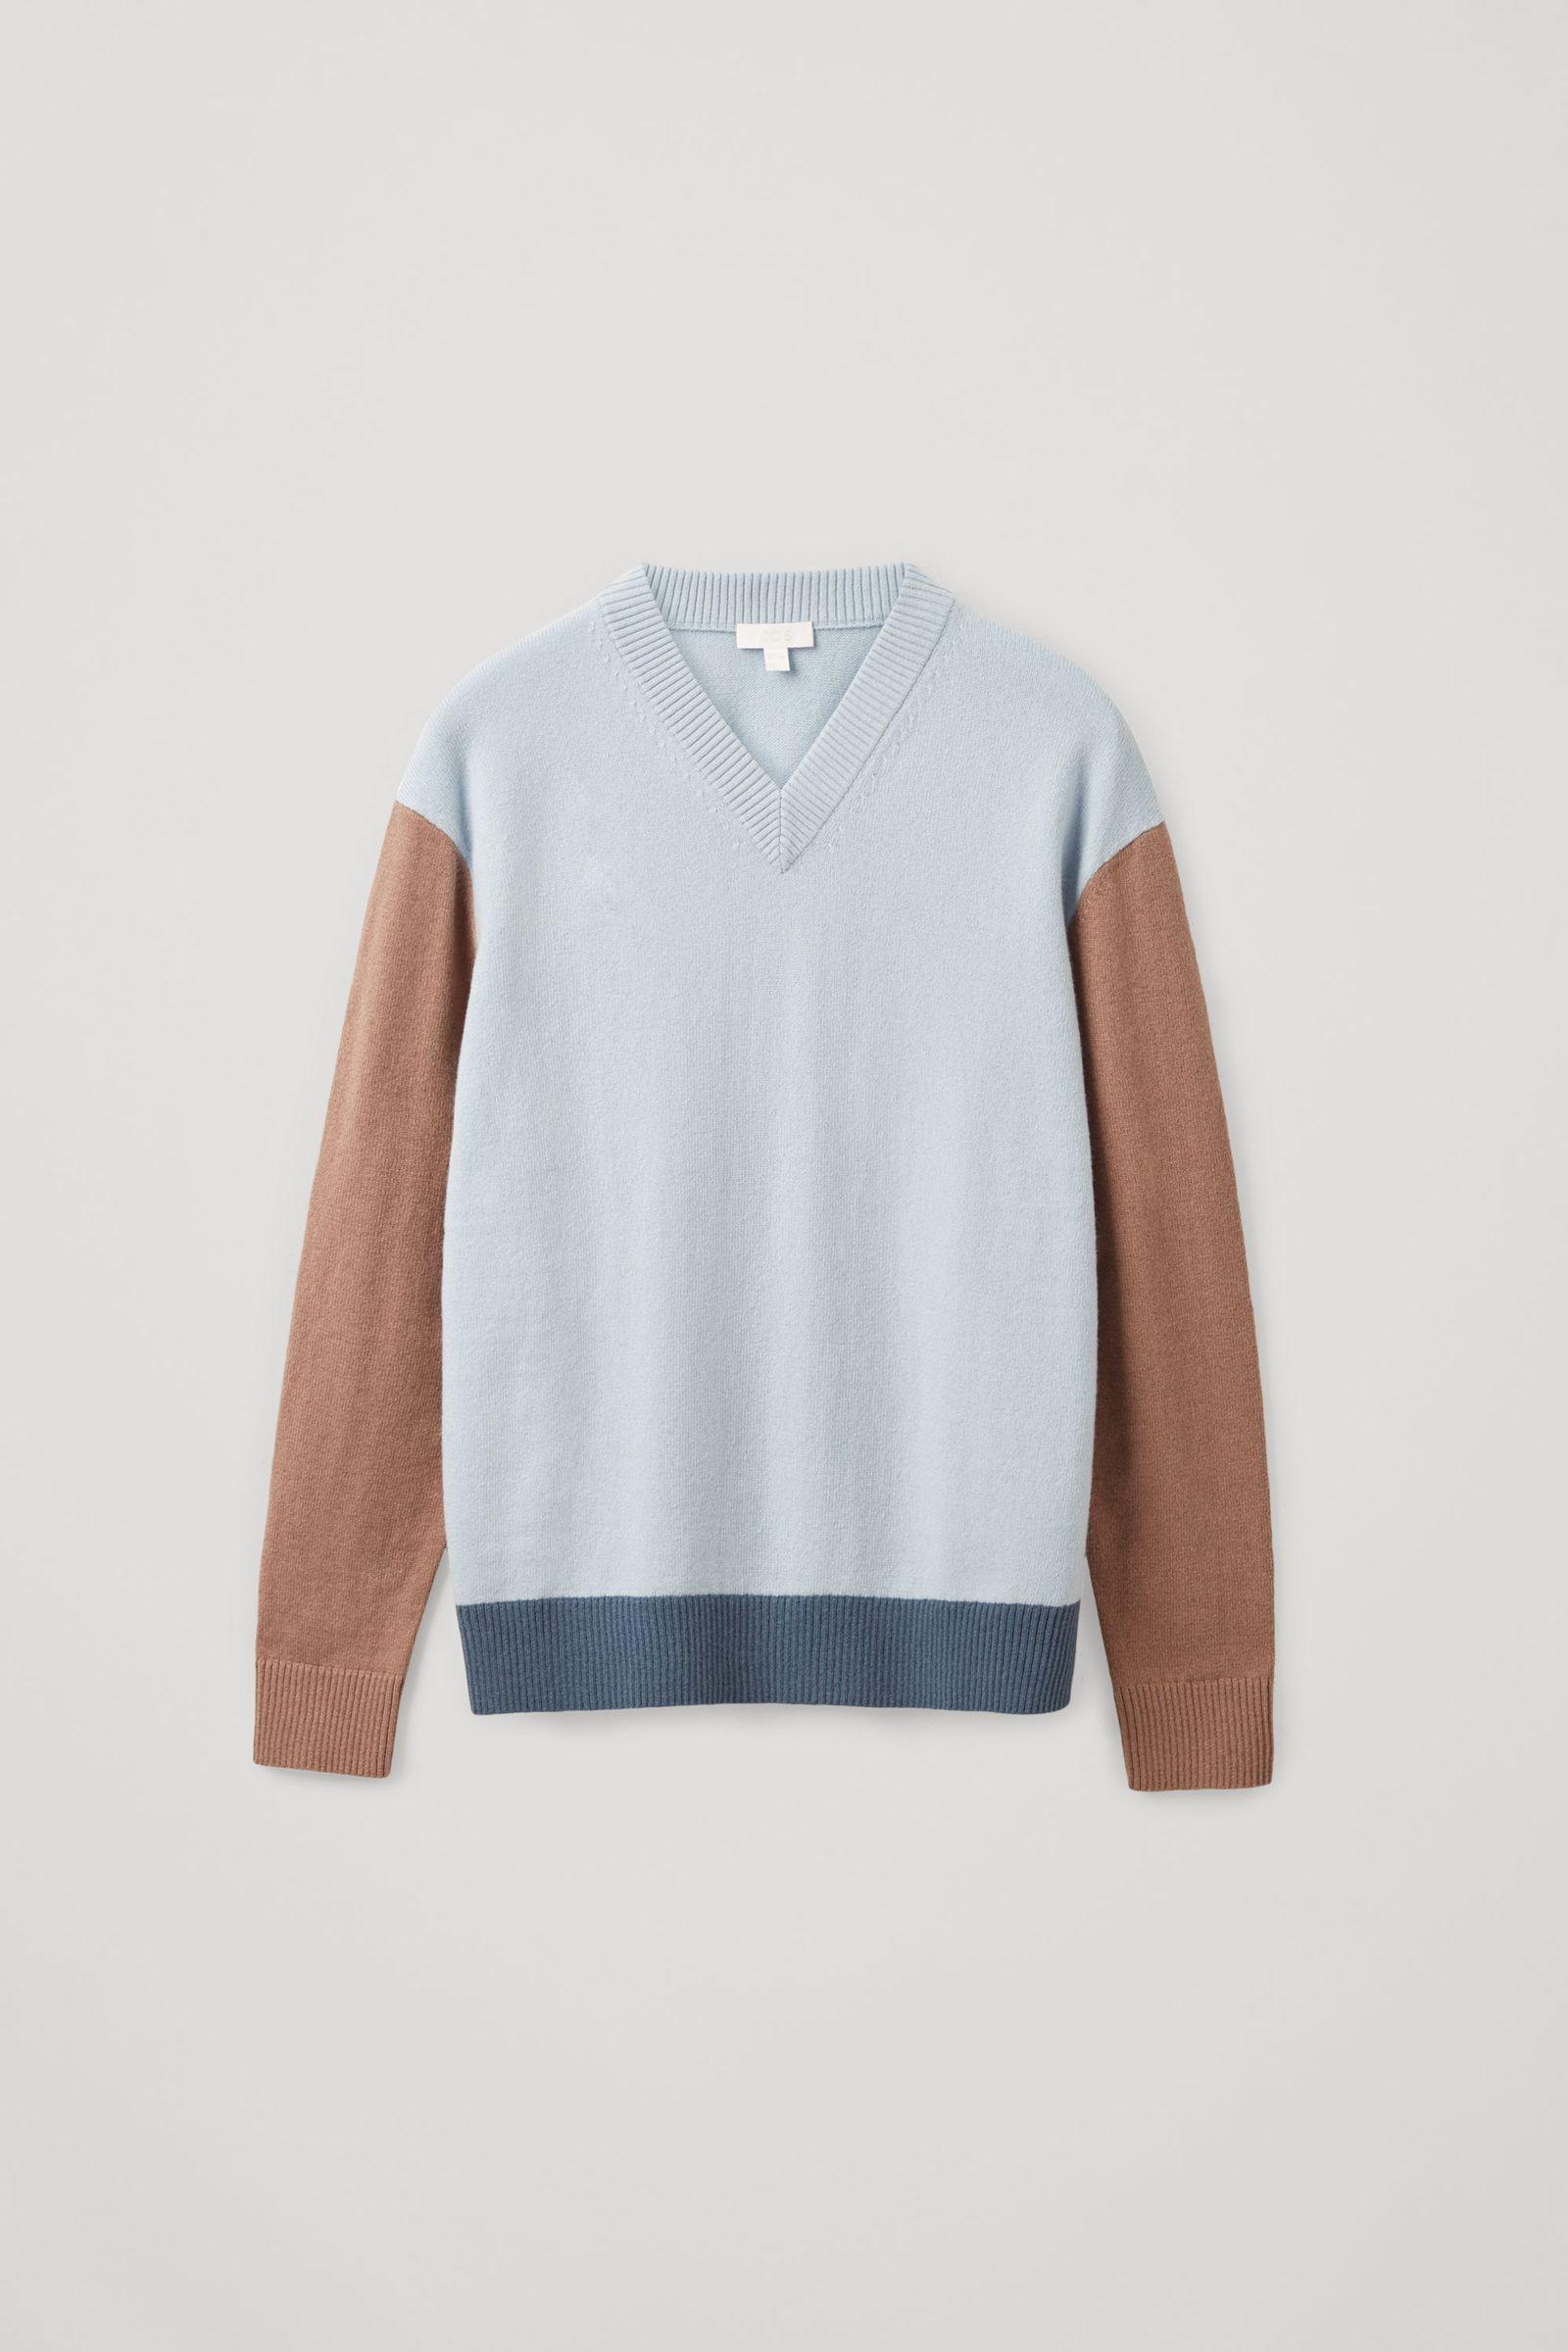 COS 컬러 블록 울 코튼 스웨터의 터쿼이즈컬러 Product입니다.